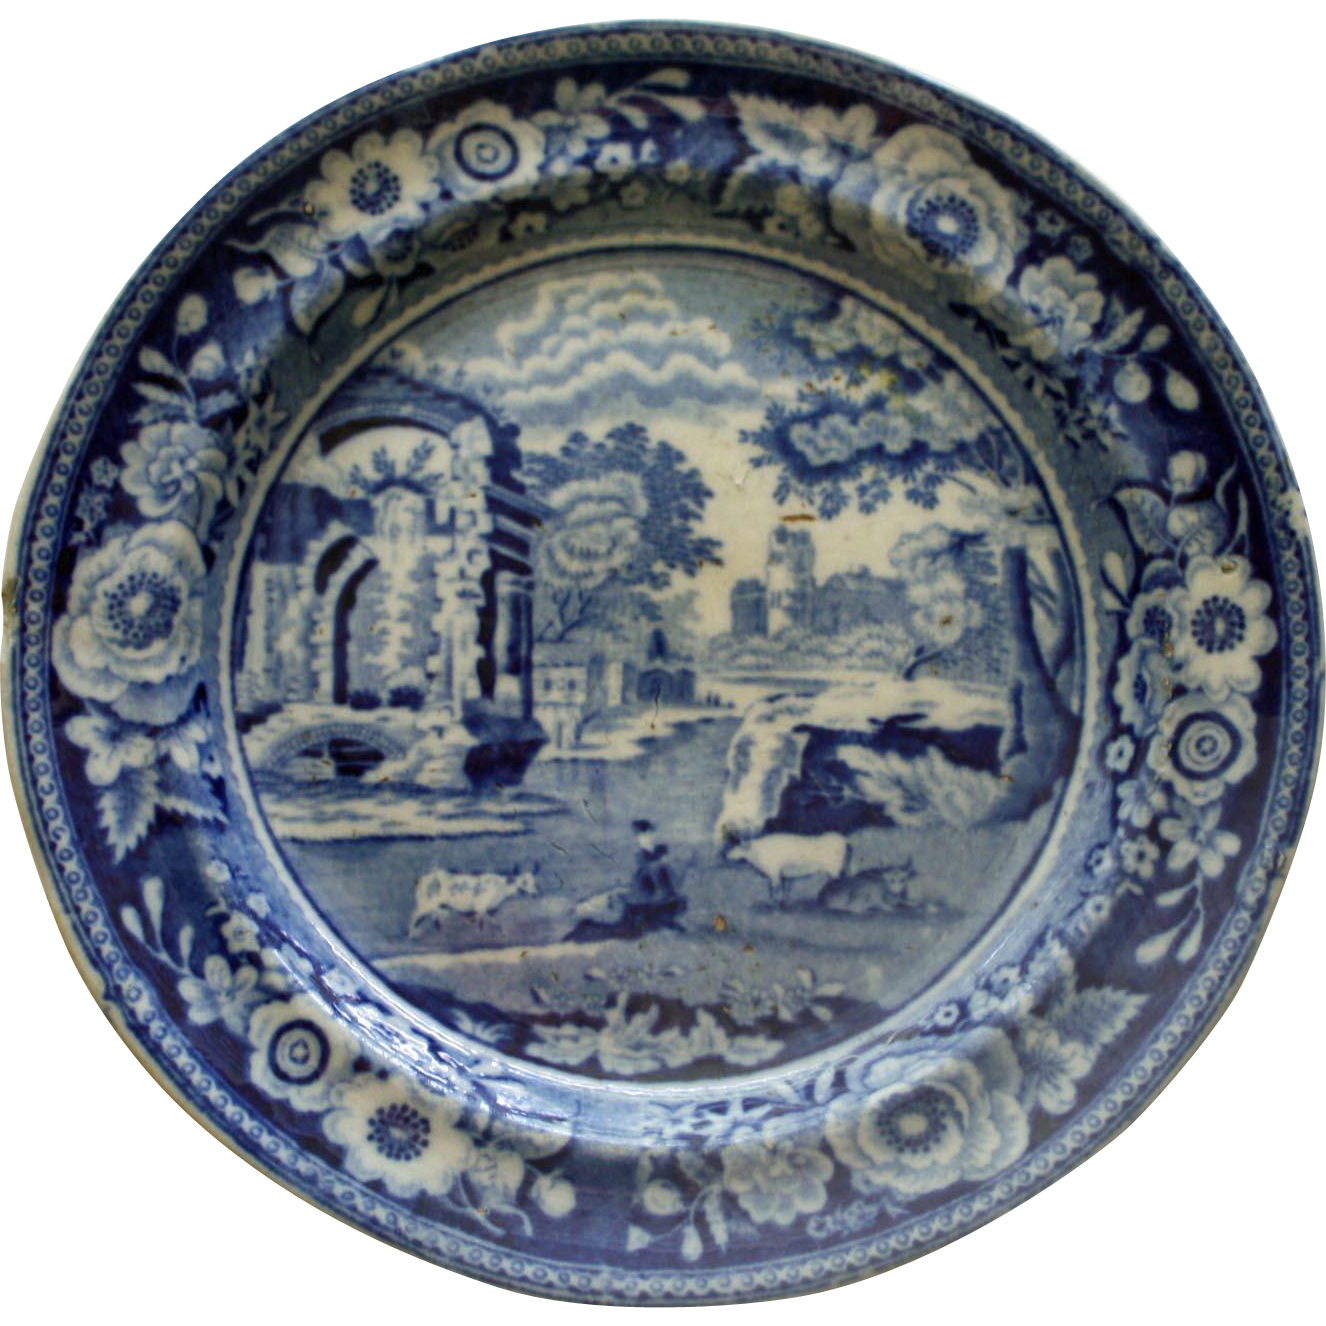 c.1825 Staffordshire Blue English Transferware Plate - Italian